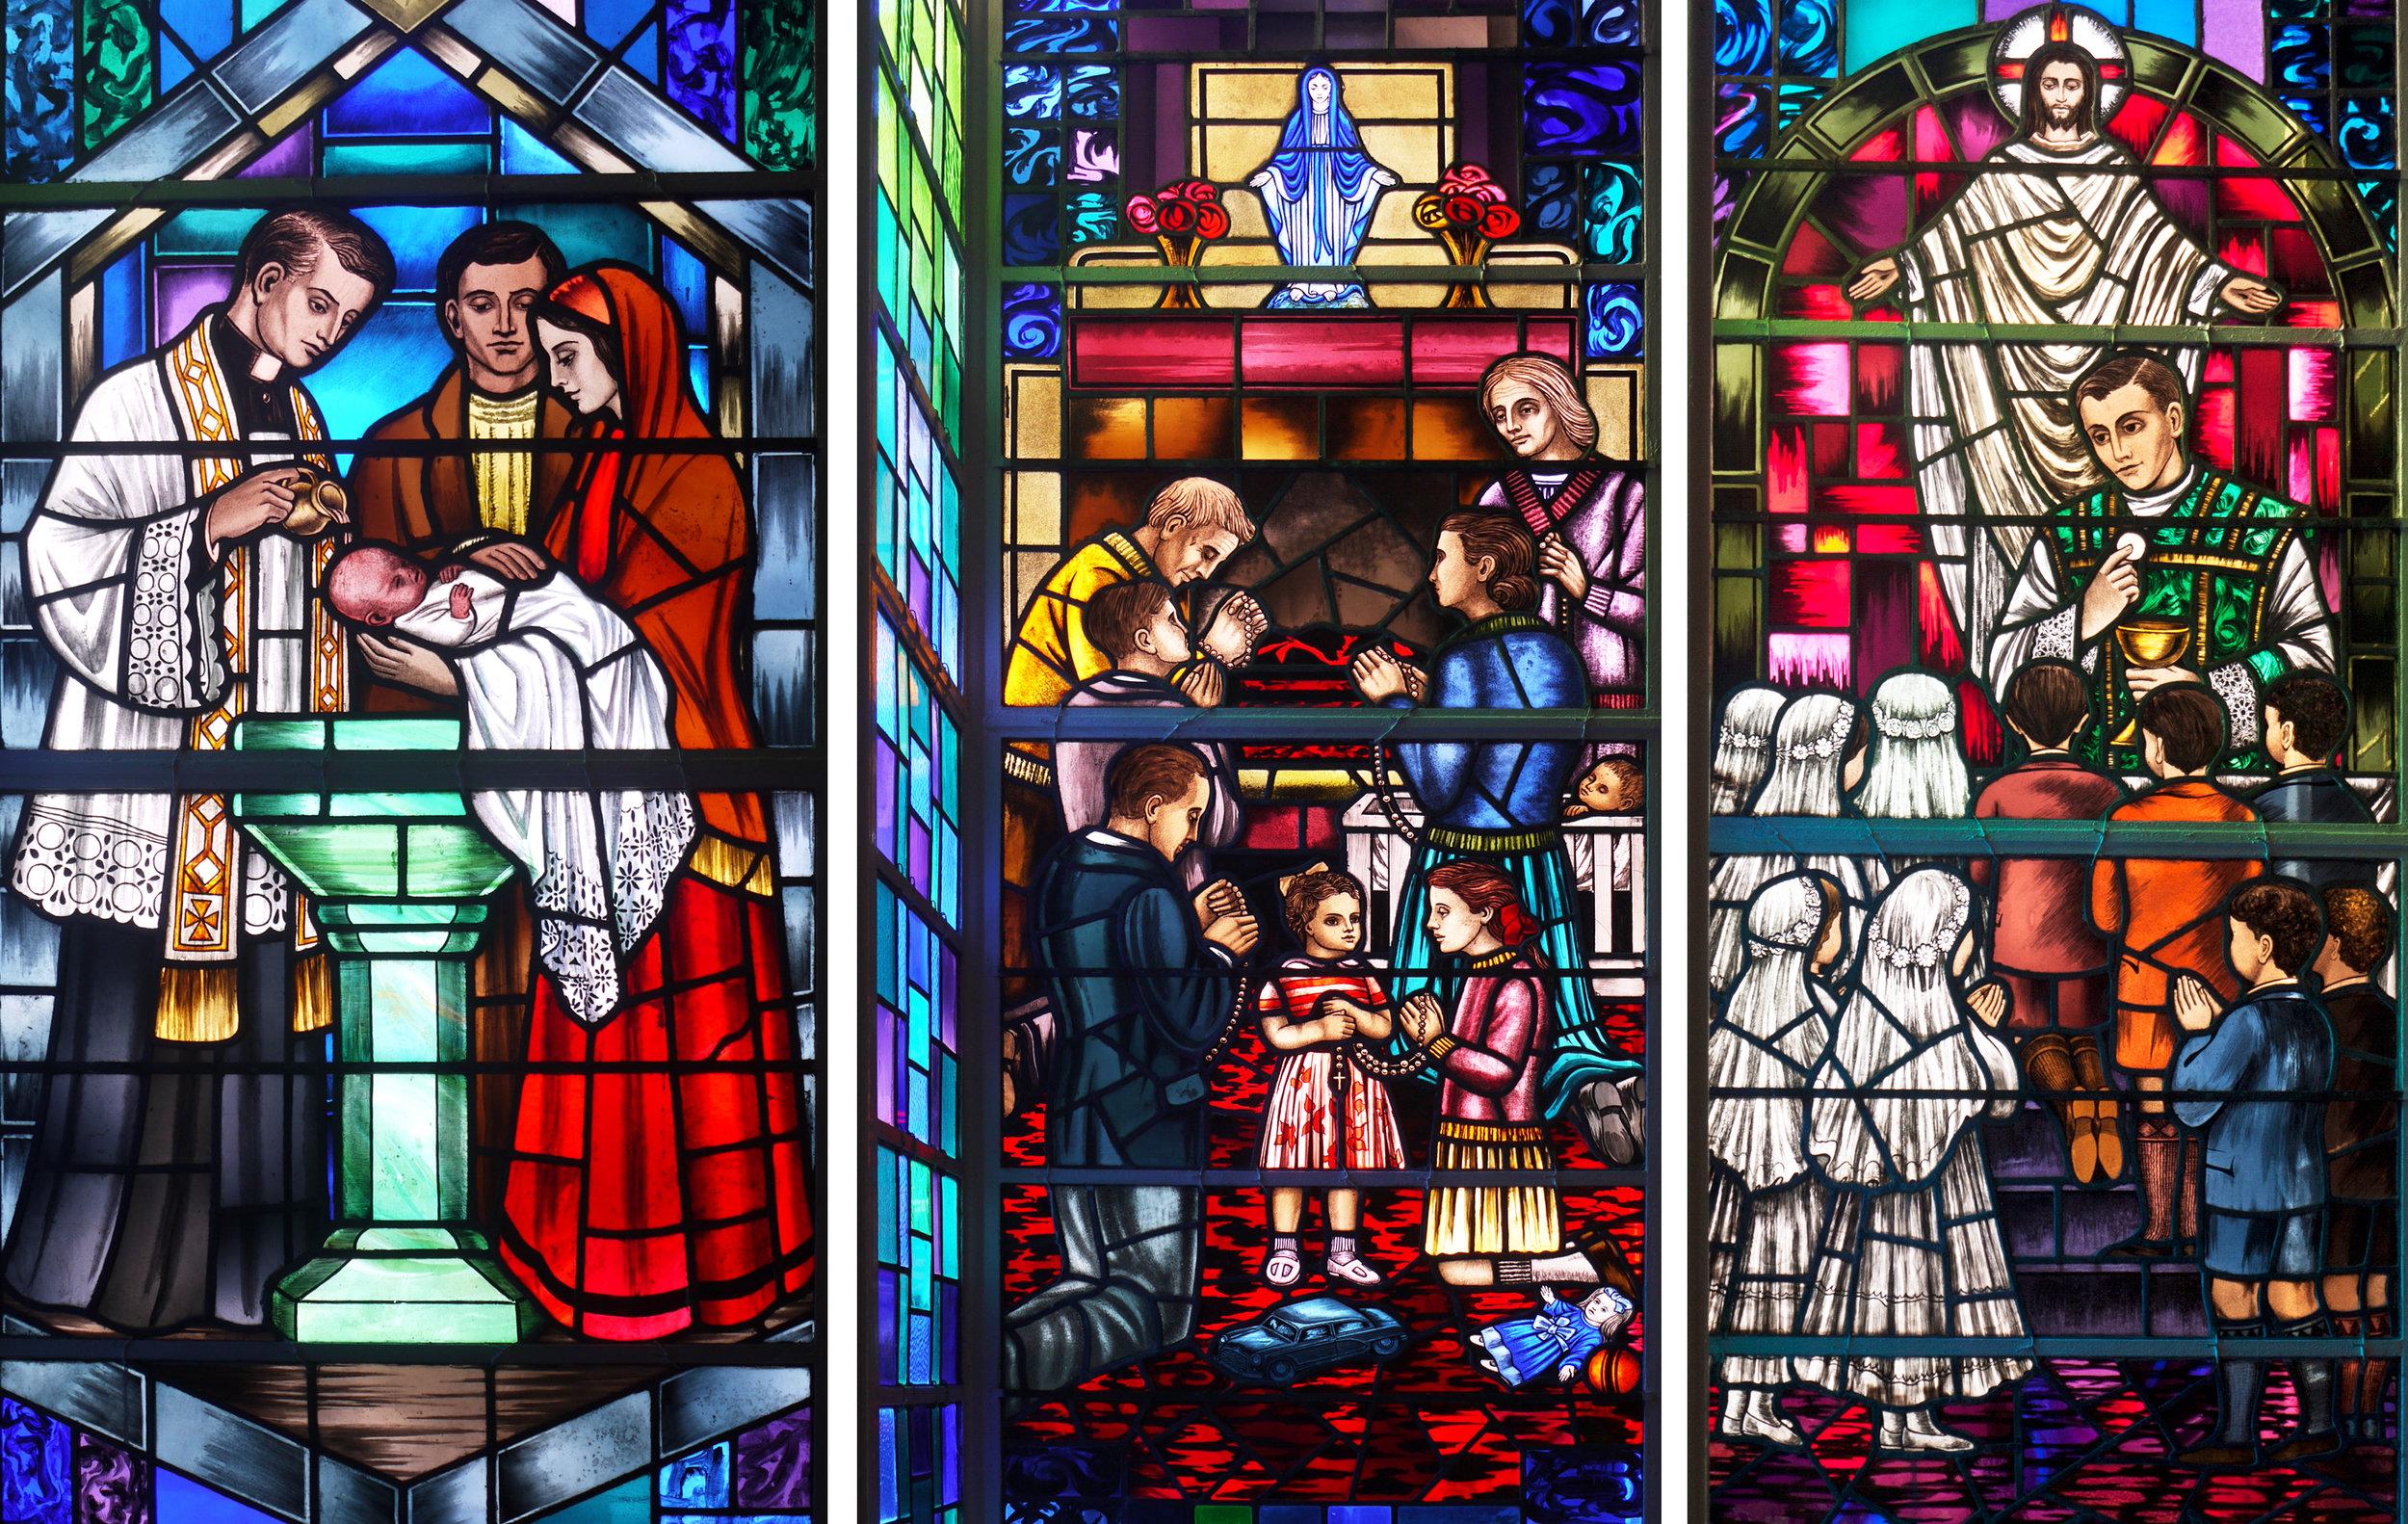 Panel 1 Baptism, Panel 2 Family Prayers, Panel 3 First Communicants